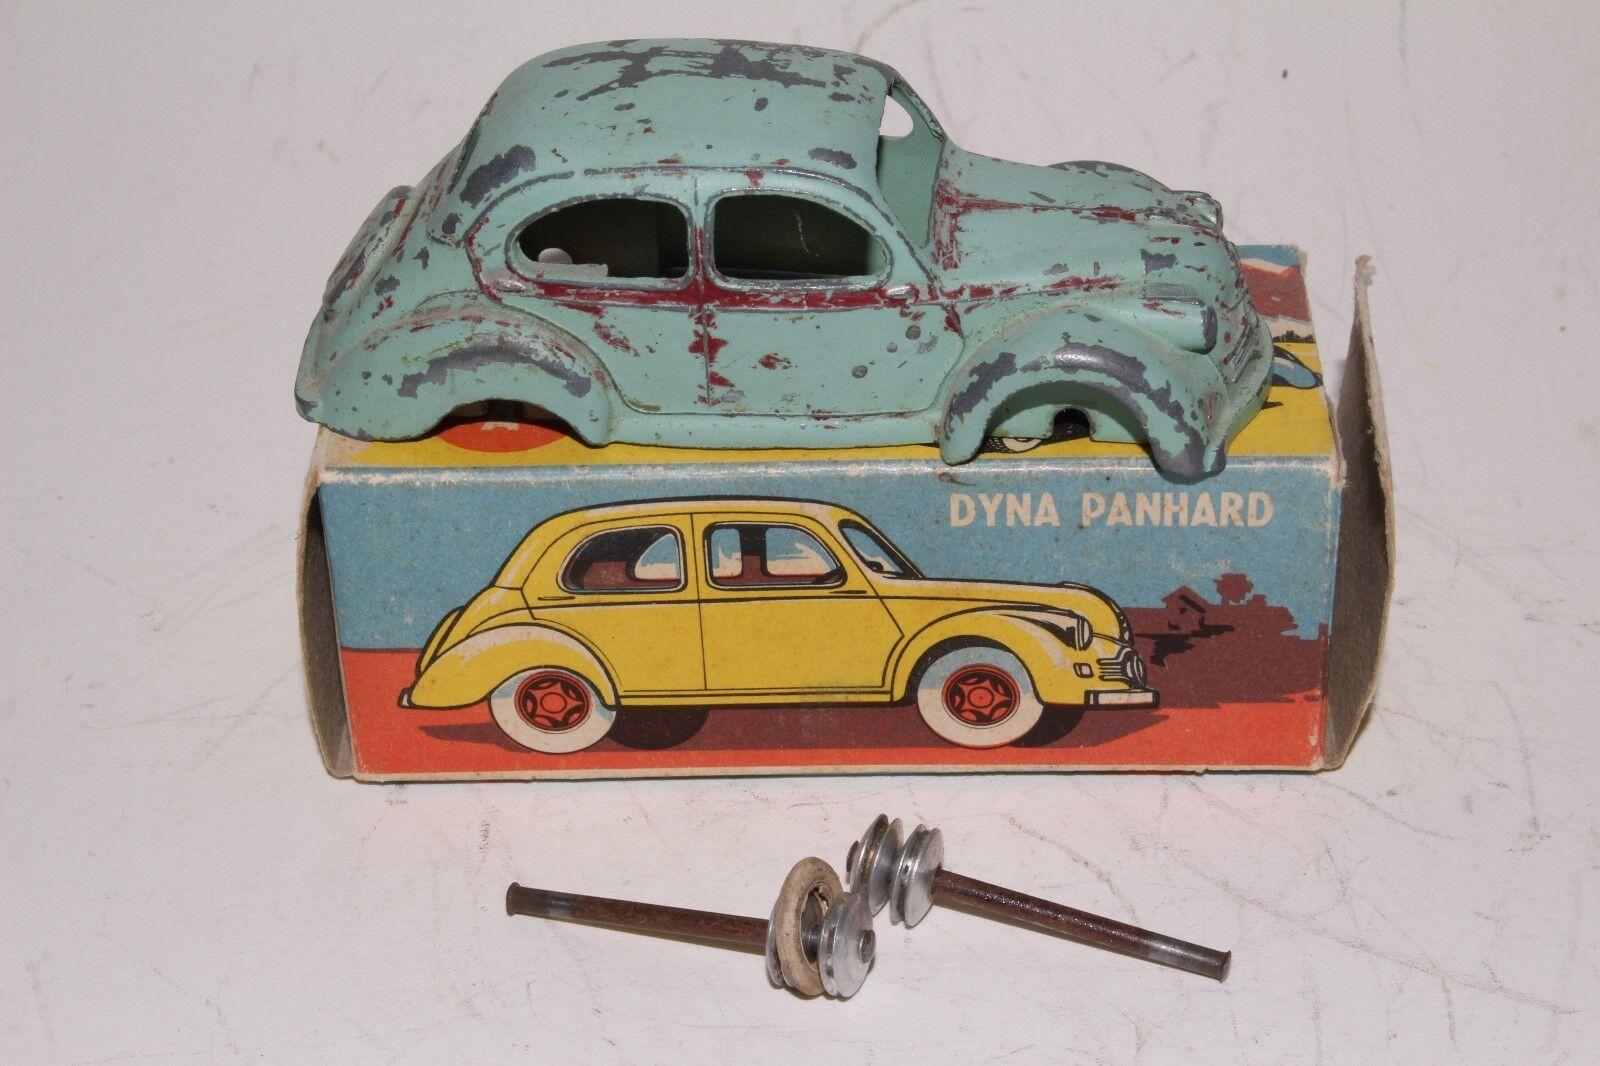 Década de 1950 CIJ Dyna PANHARD Sedan, caja original, Piezas